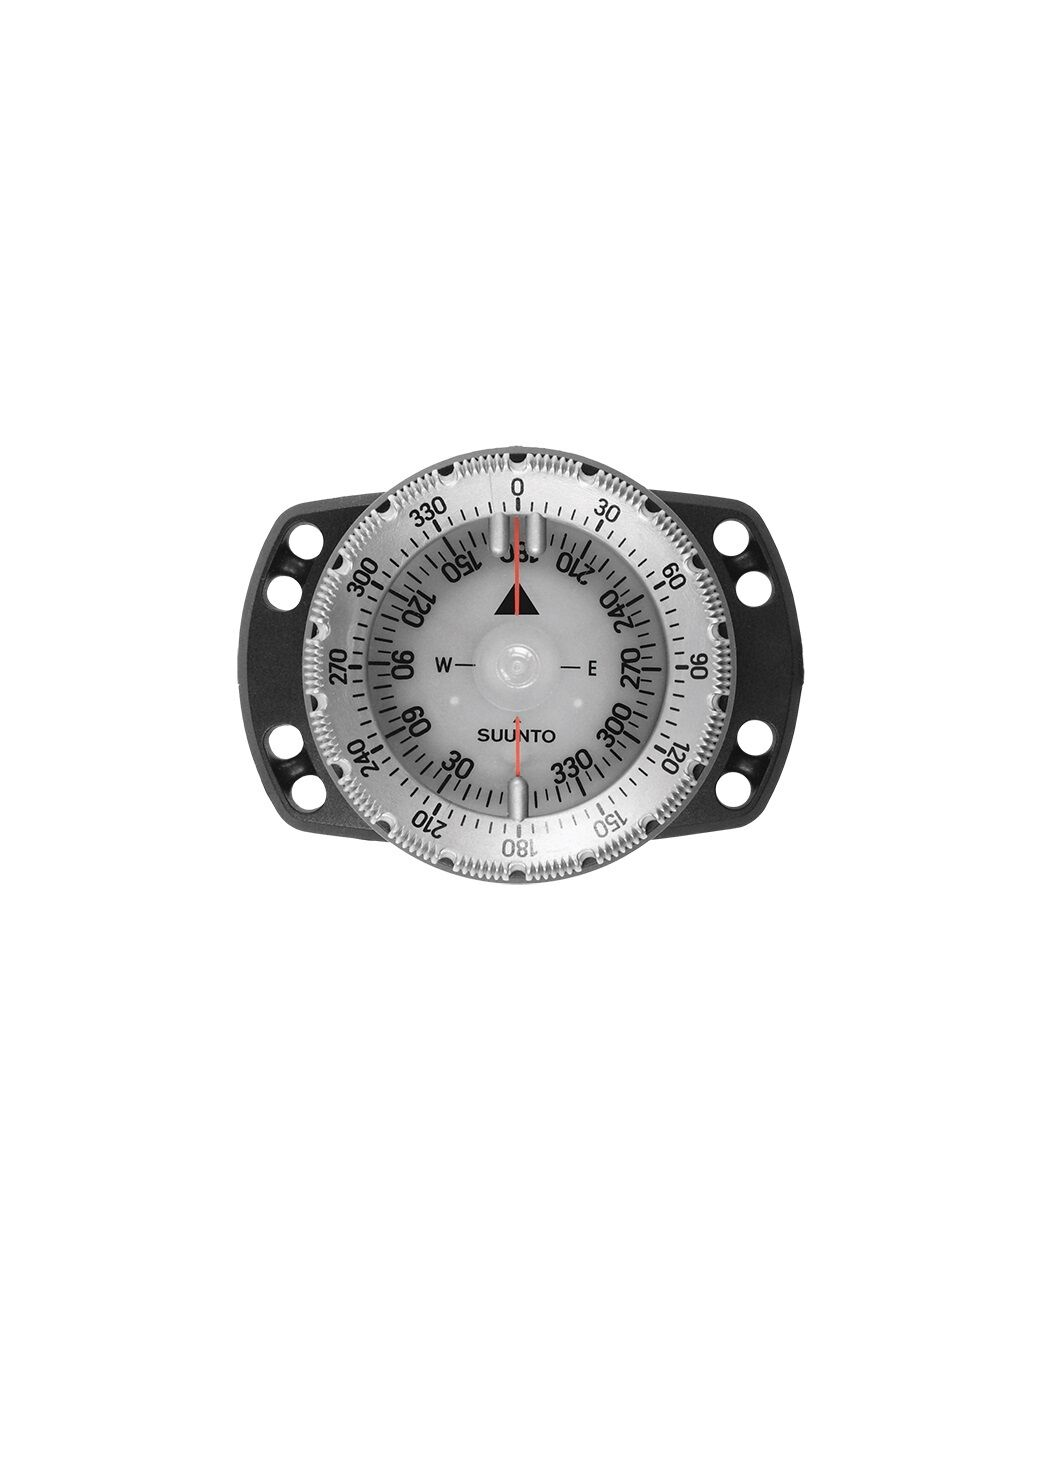 Suunto SK-8 Hand Bungee Mount Compass Scuba Diving SS021118000